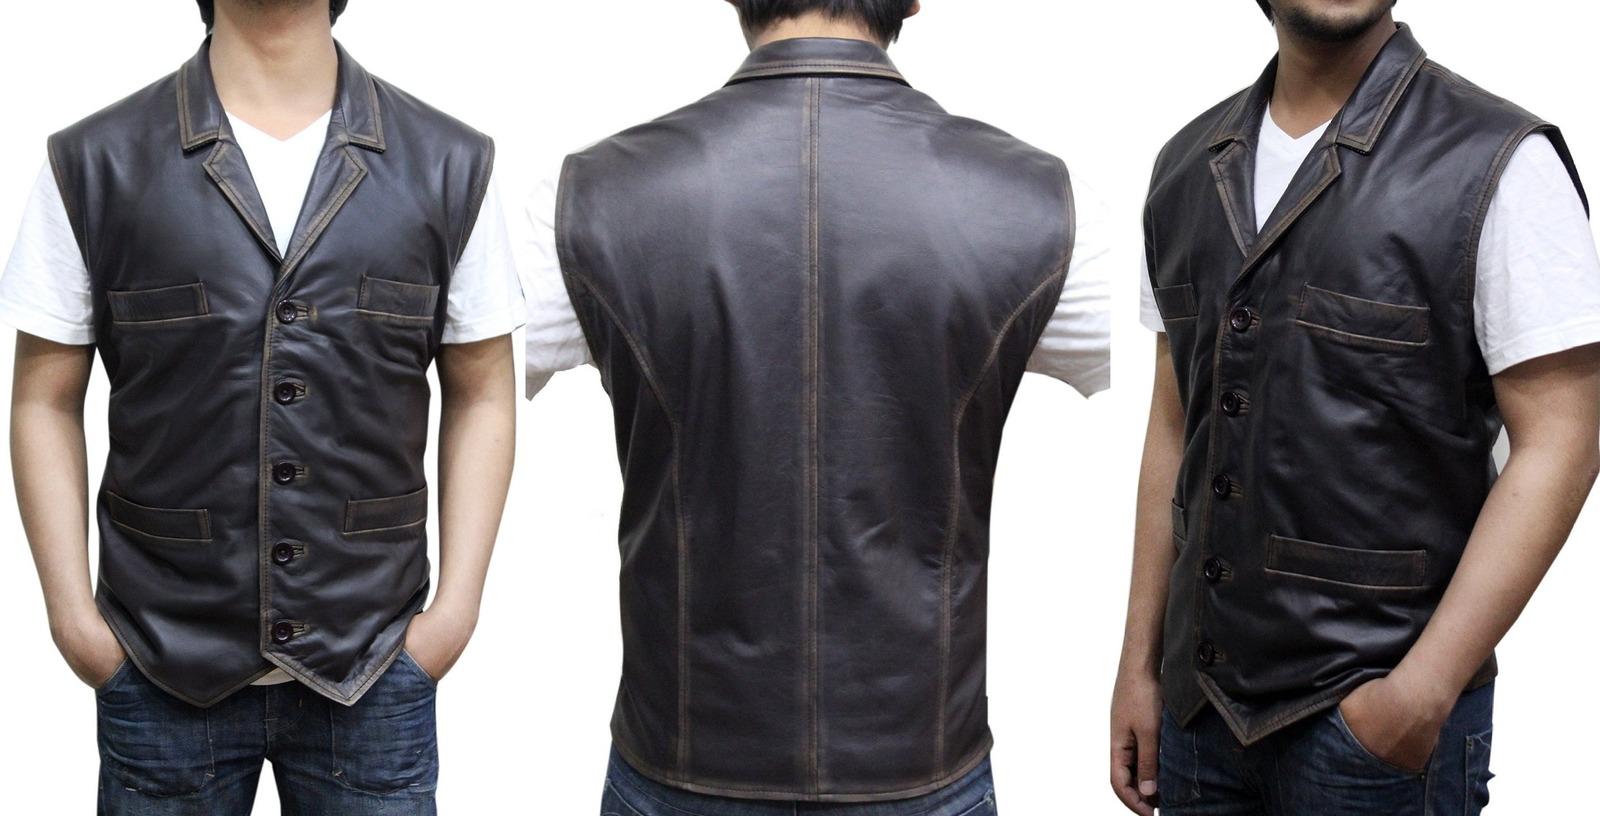 48b8dbe2cec76 Cullen Bohannan Hell on Wheels Real Leather Vest ▻BEST SELLER ...